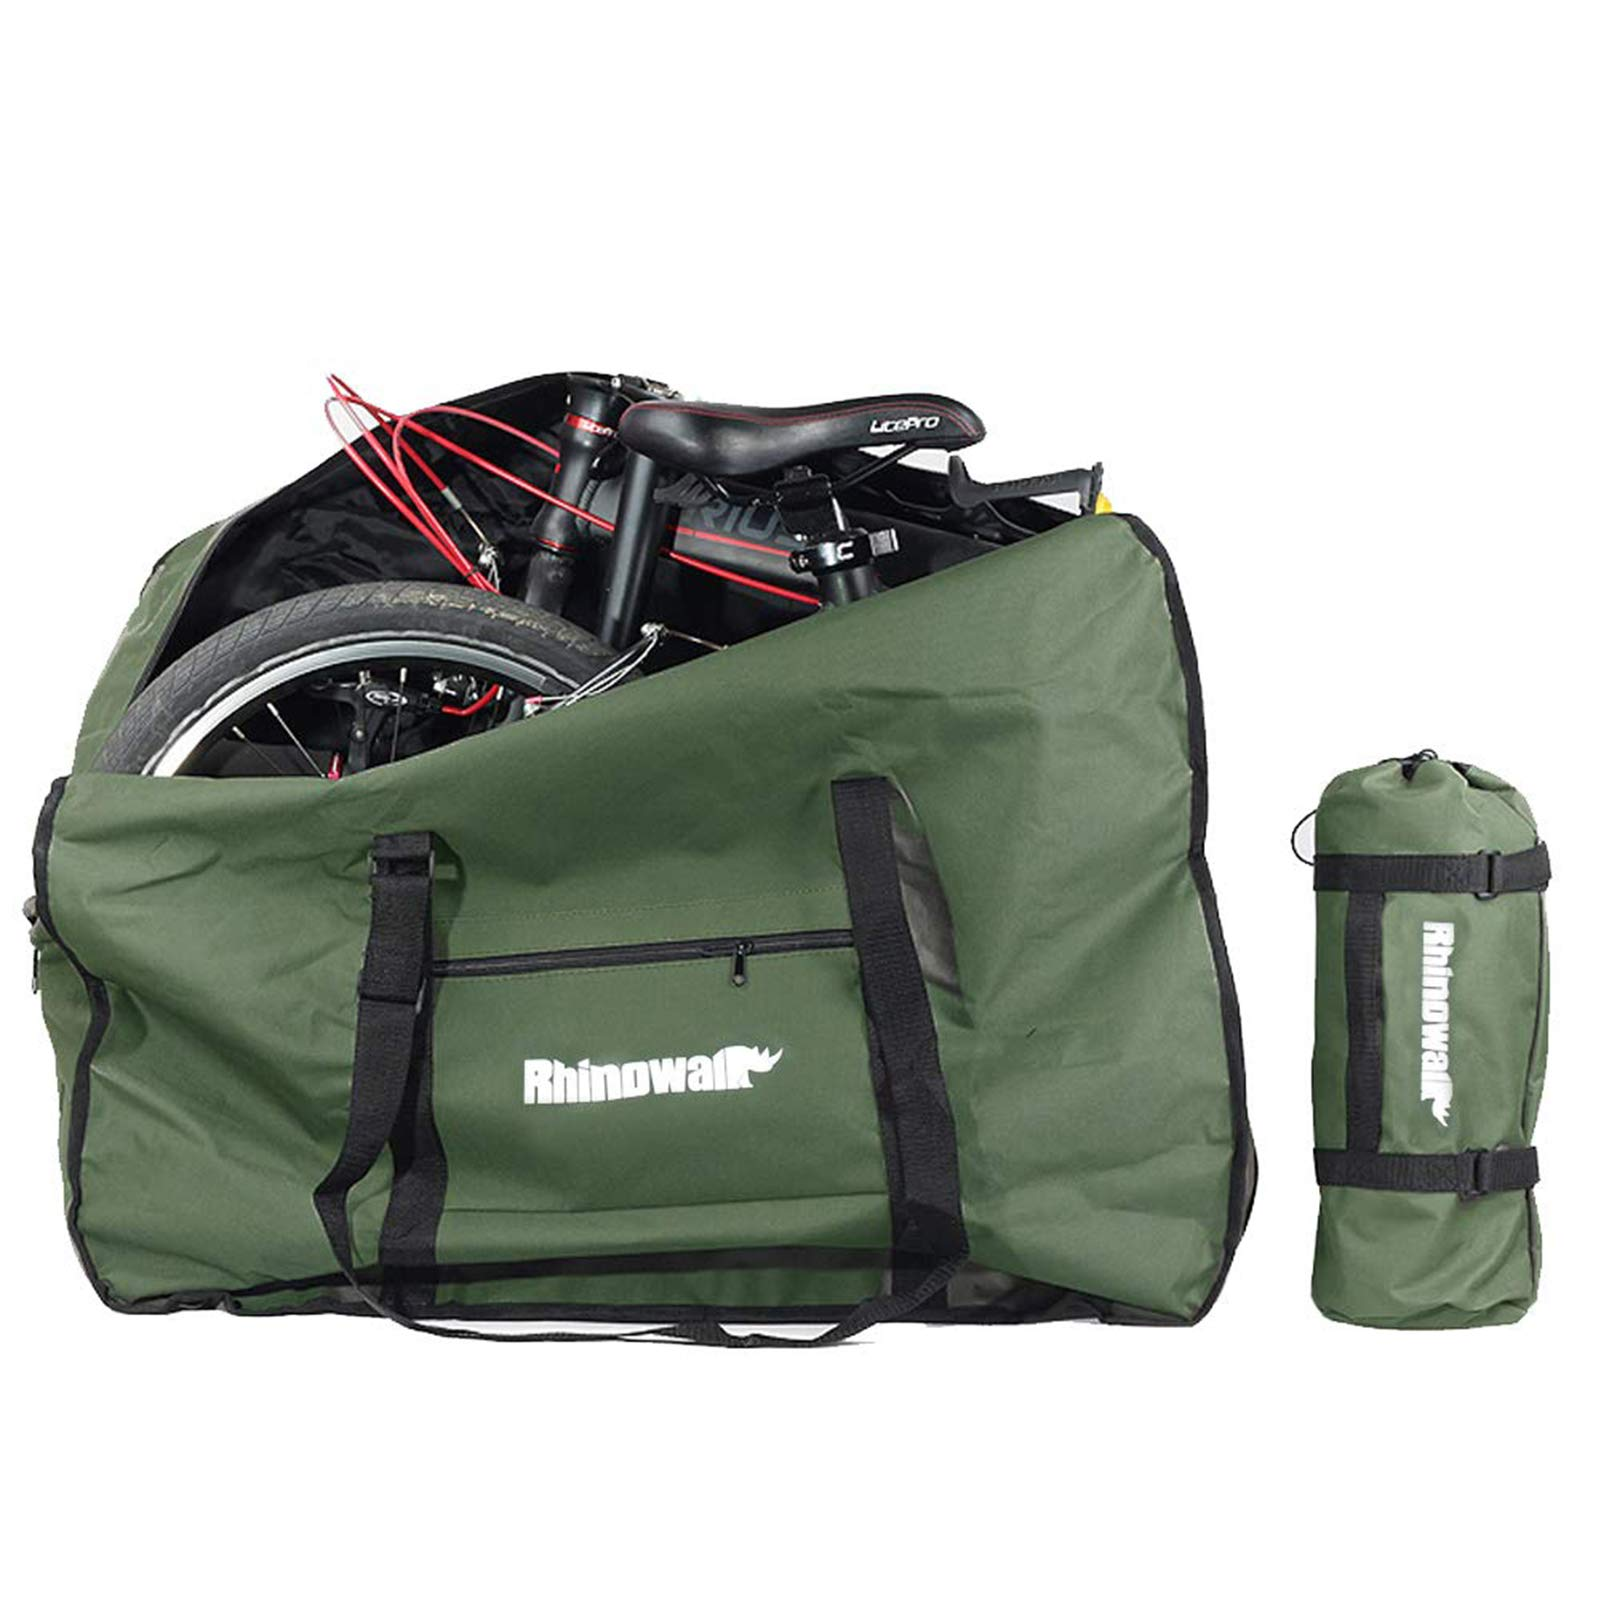 CamGo 20 Inch Folding Bike Bag